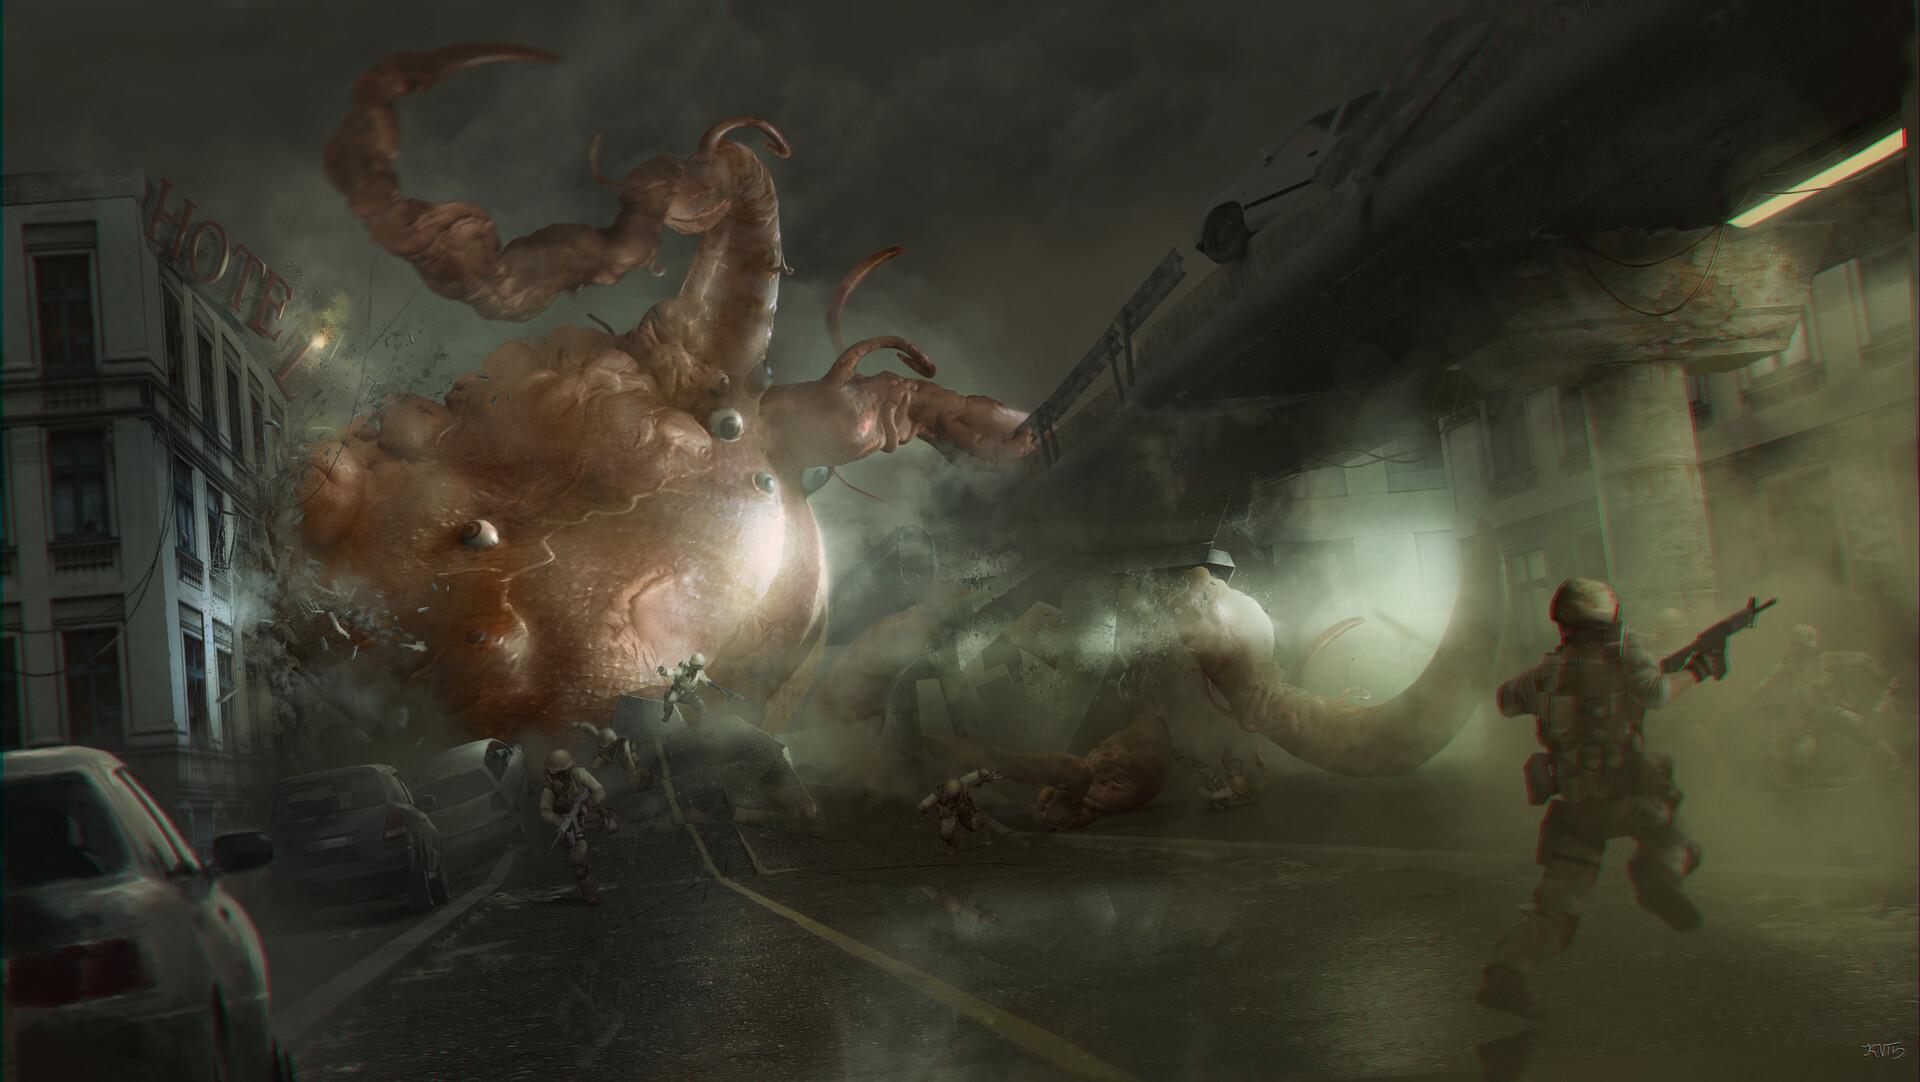 Konstantin vohwinkel monster 08 a